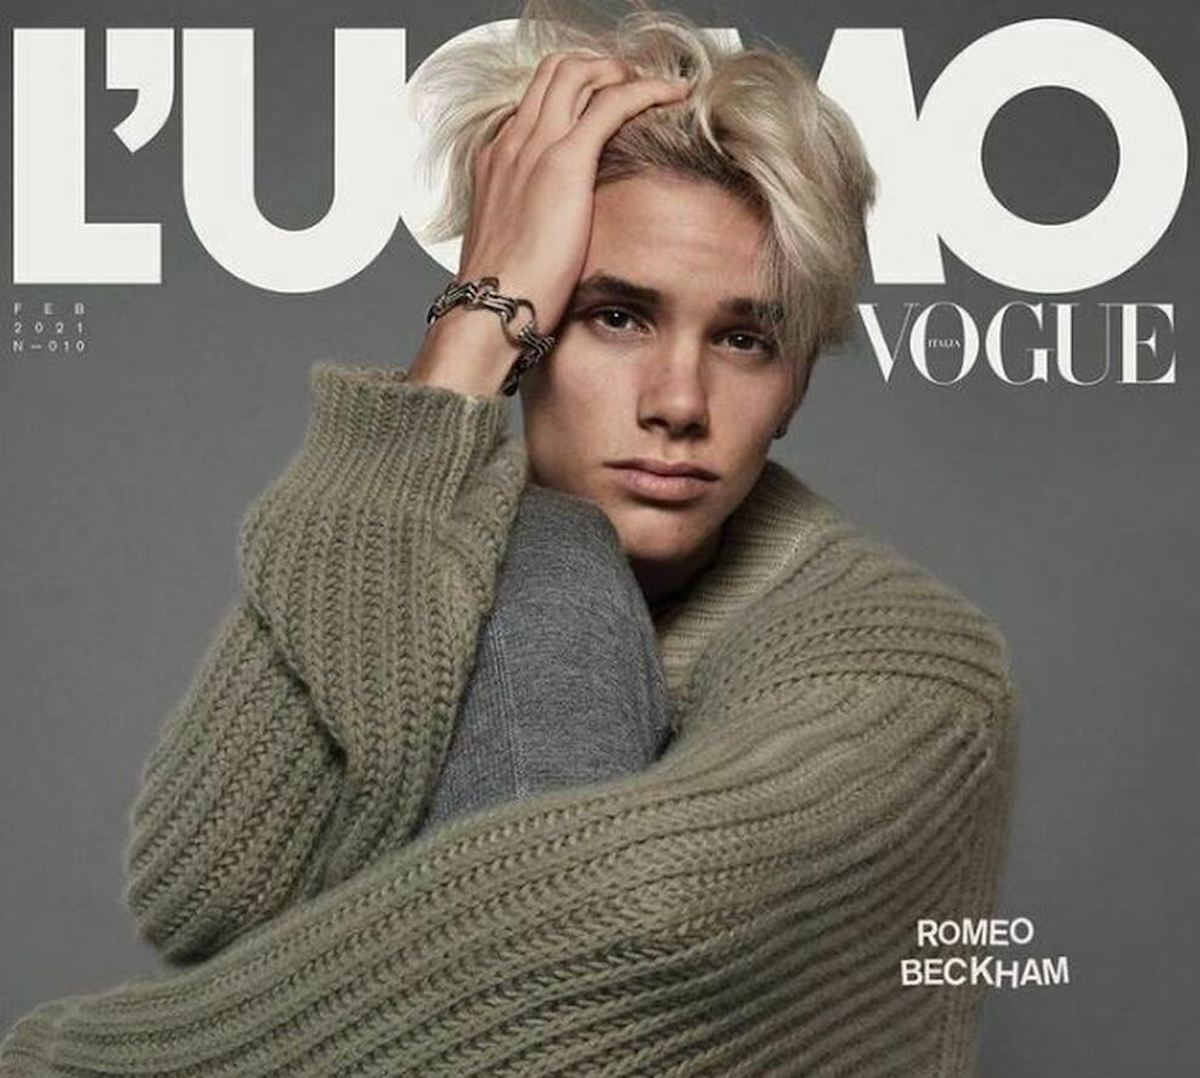 Copertina con Beckham Romeo